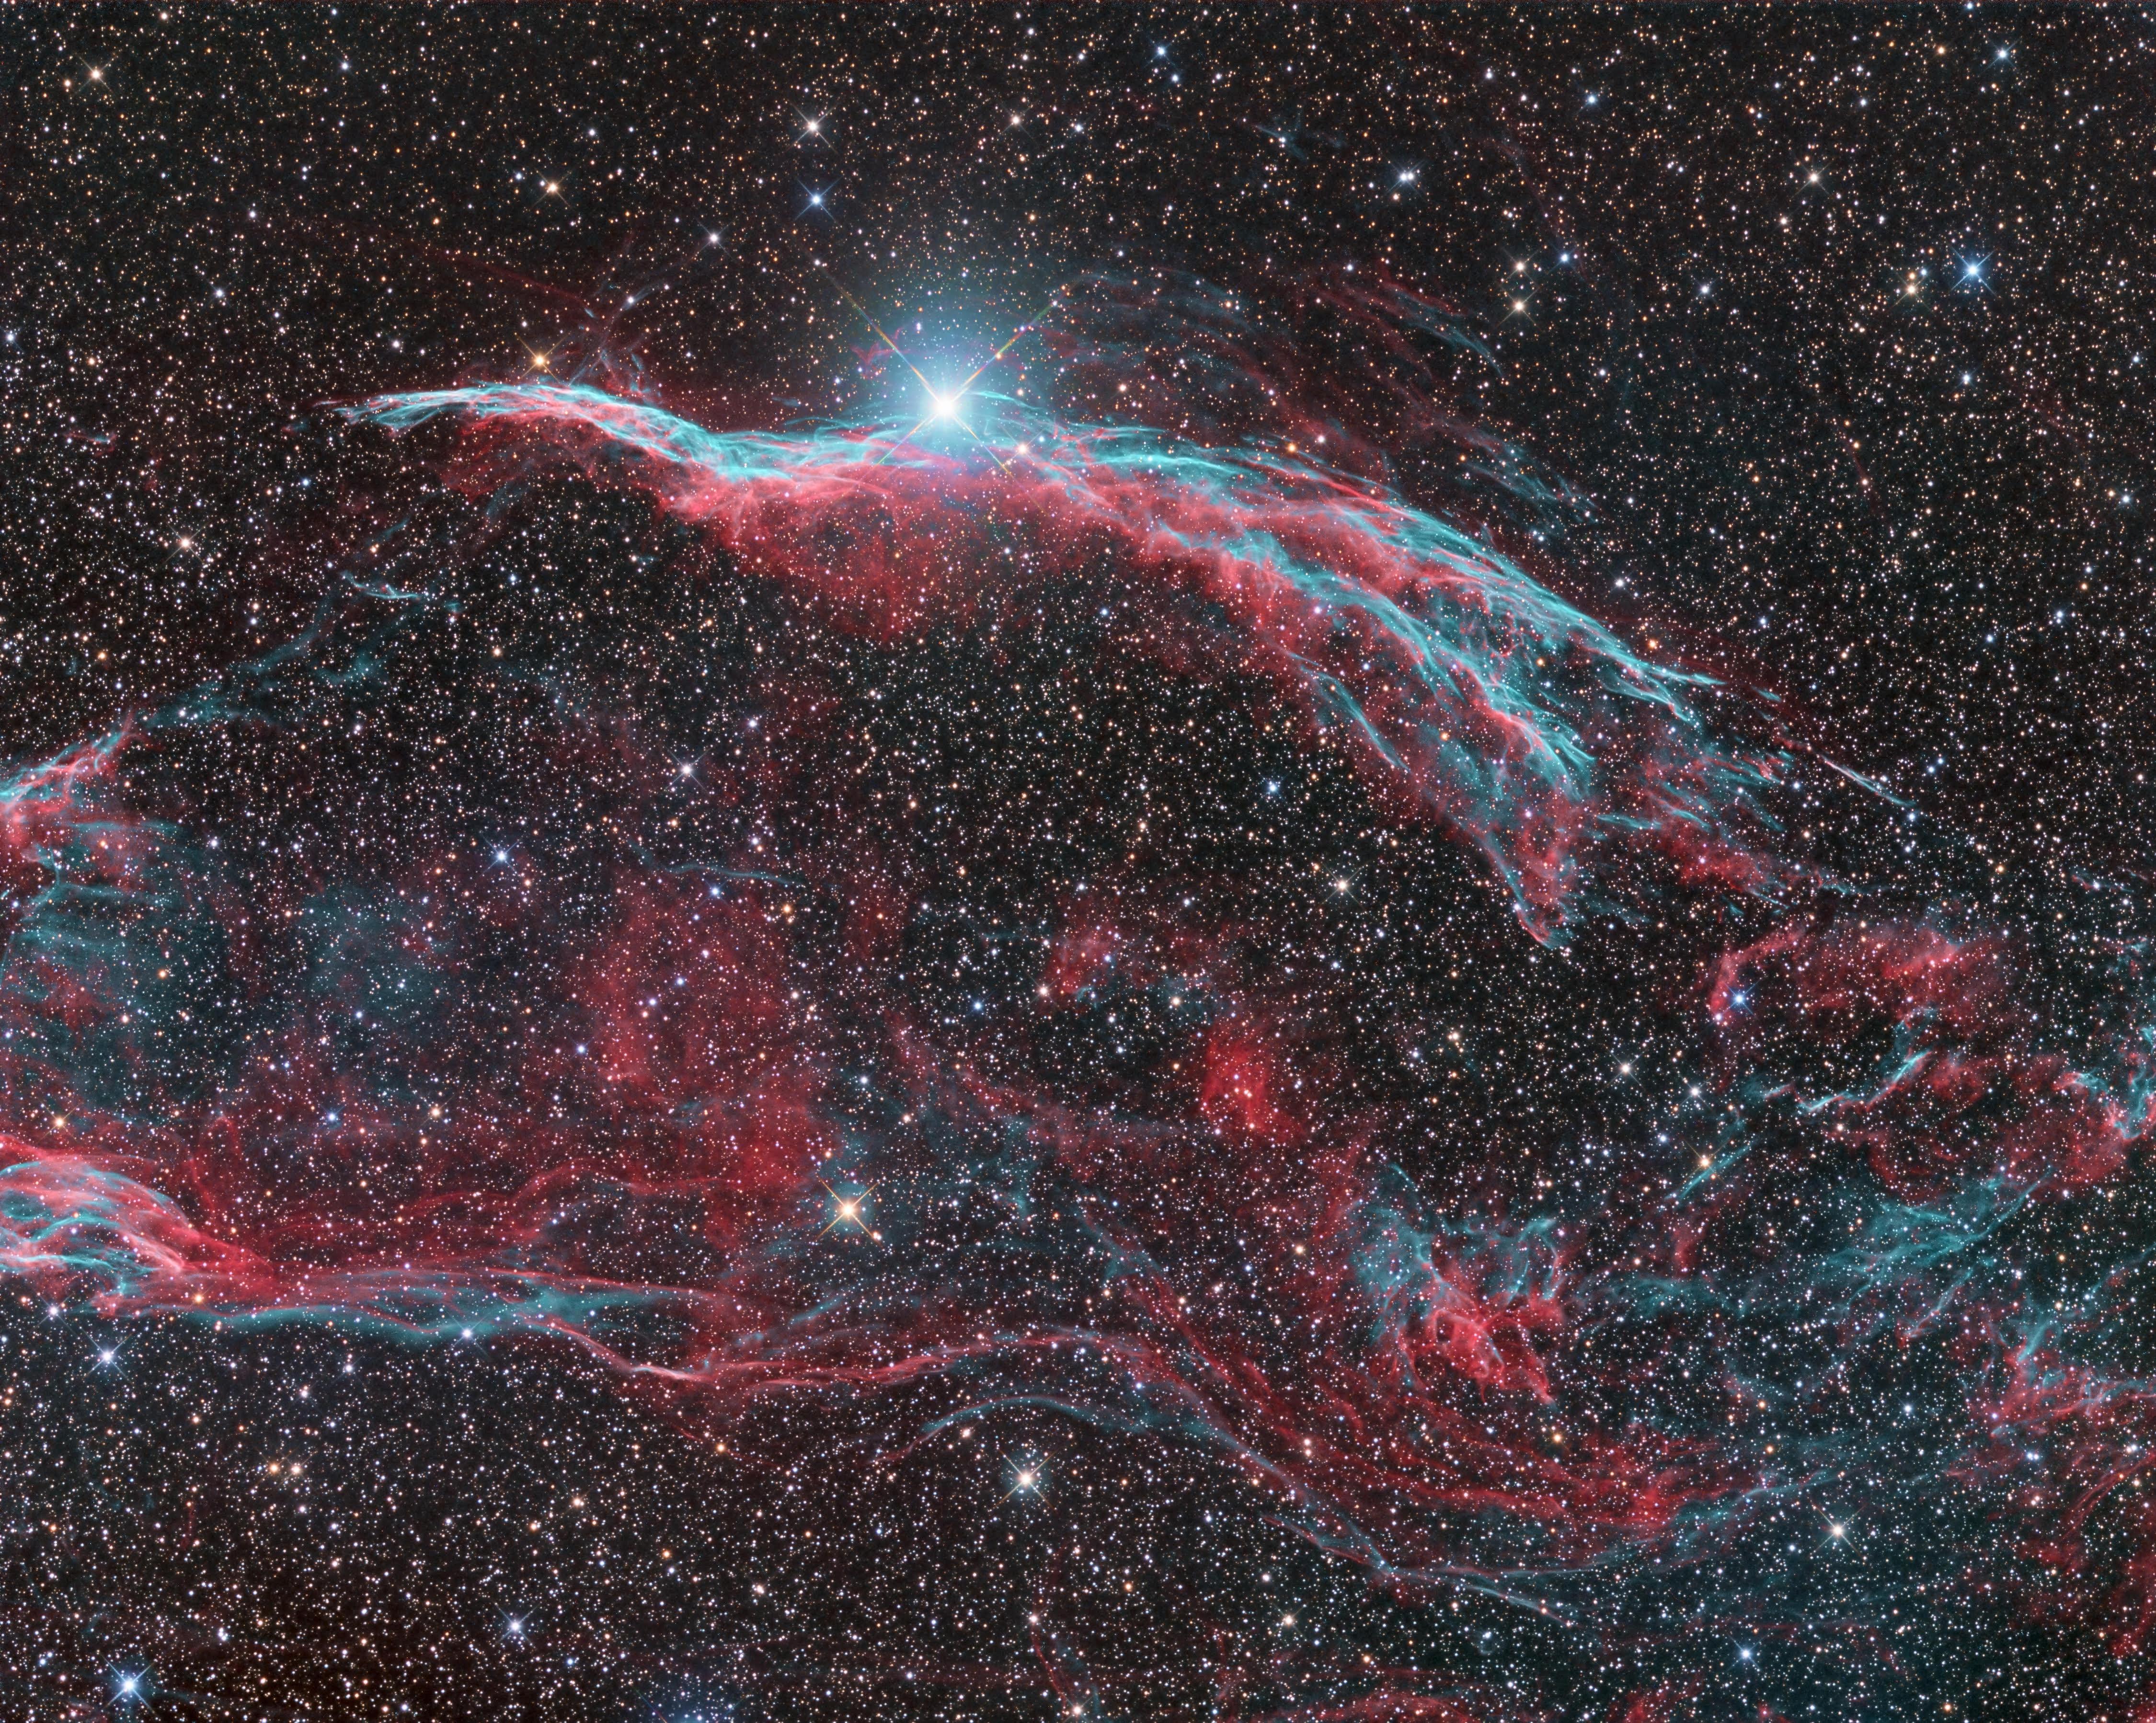 Veil Nebula Glows Red and Blue in Stunning Stargazer Photo